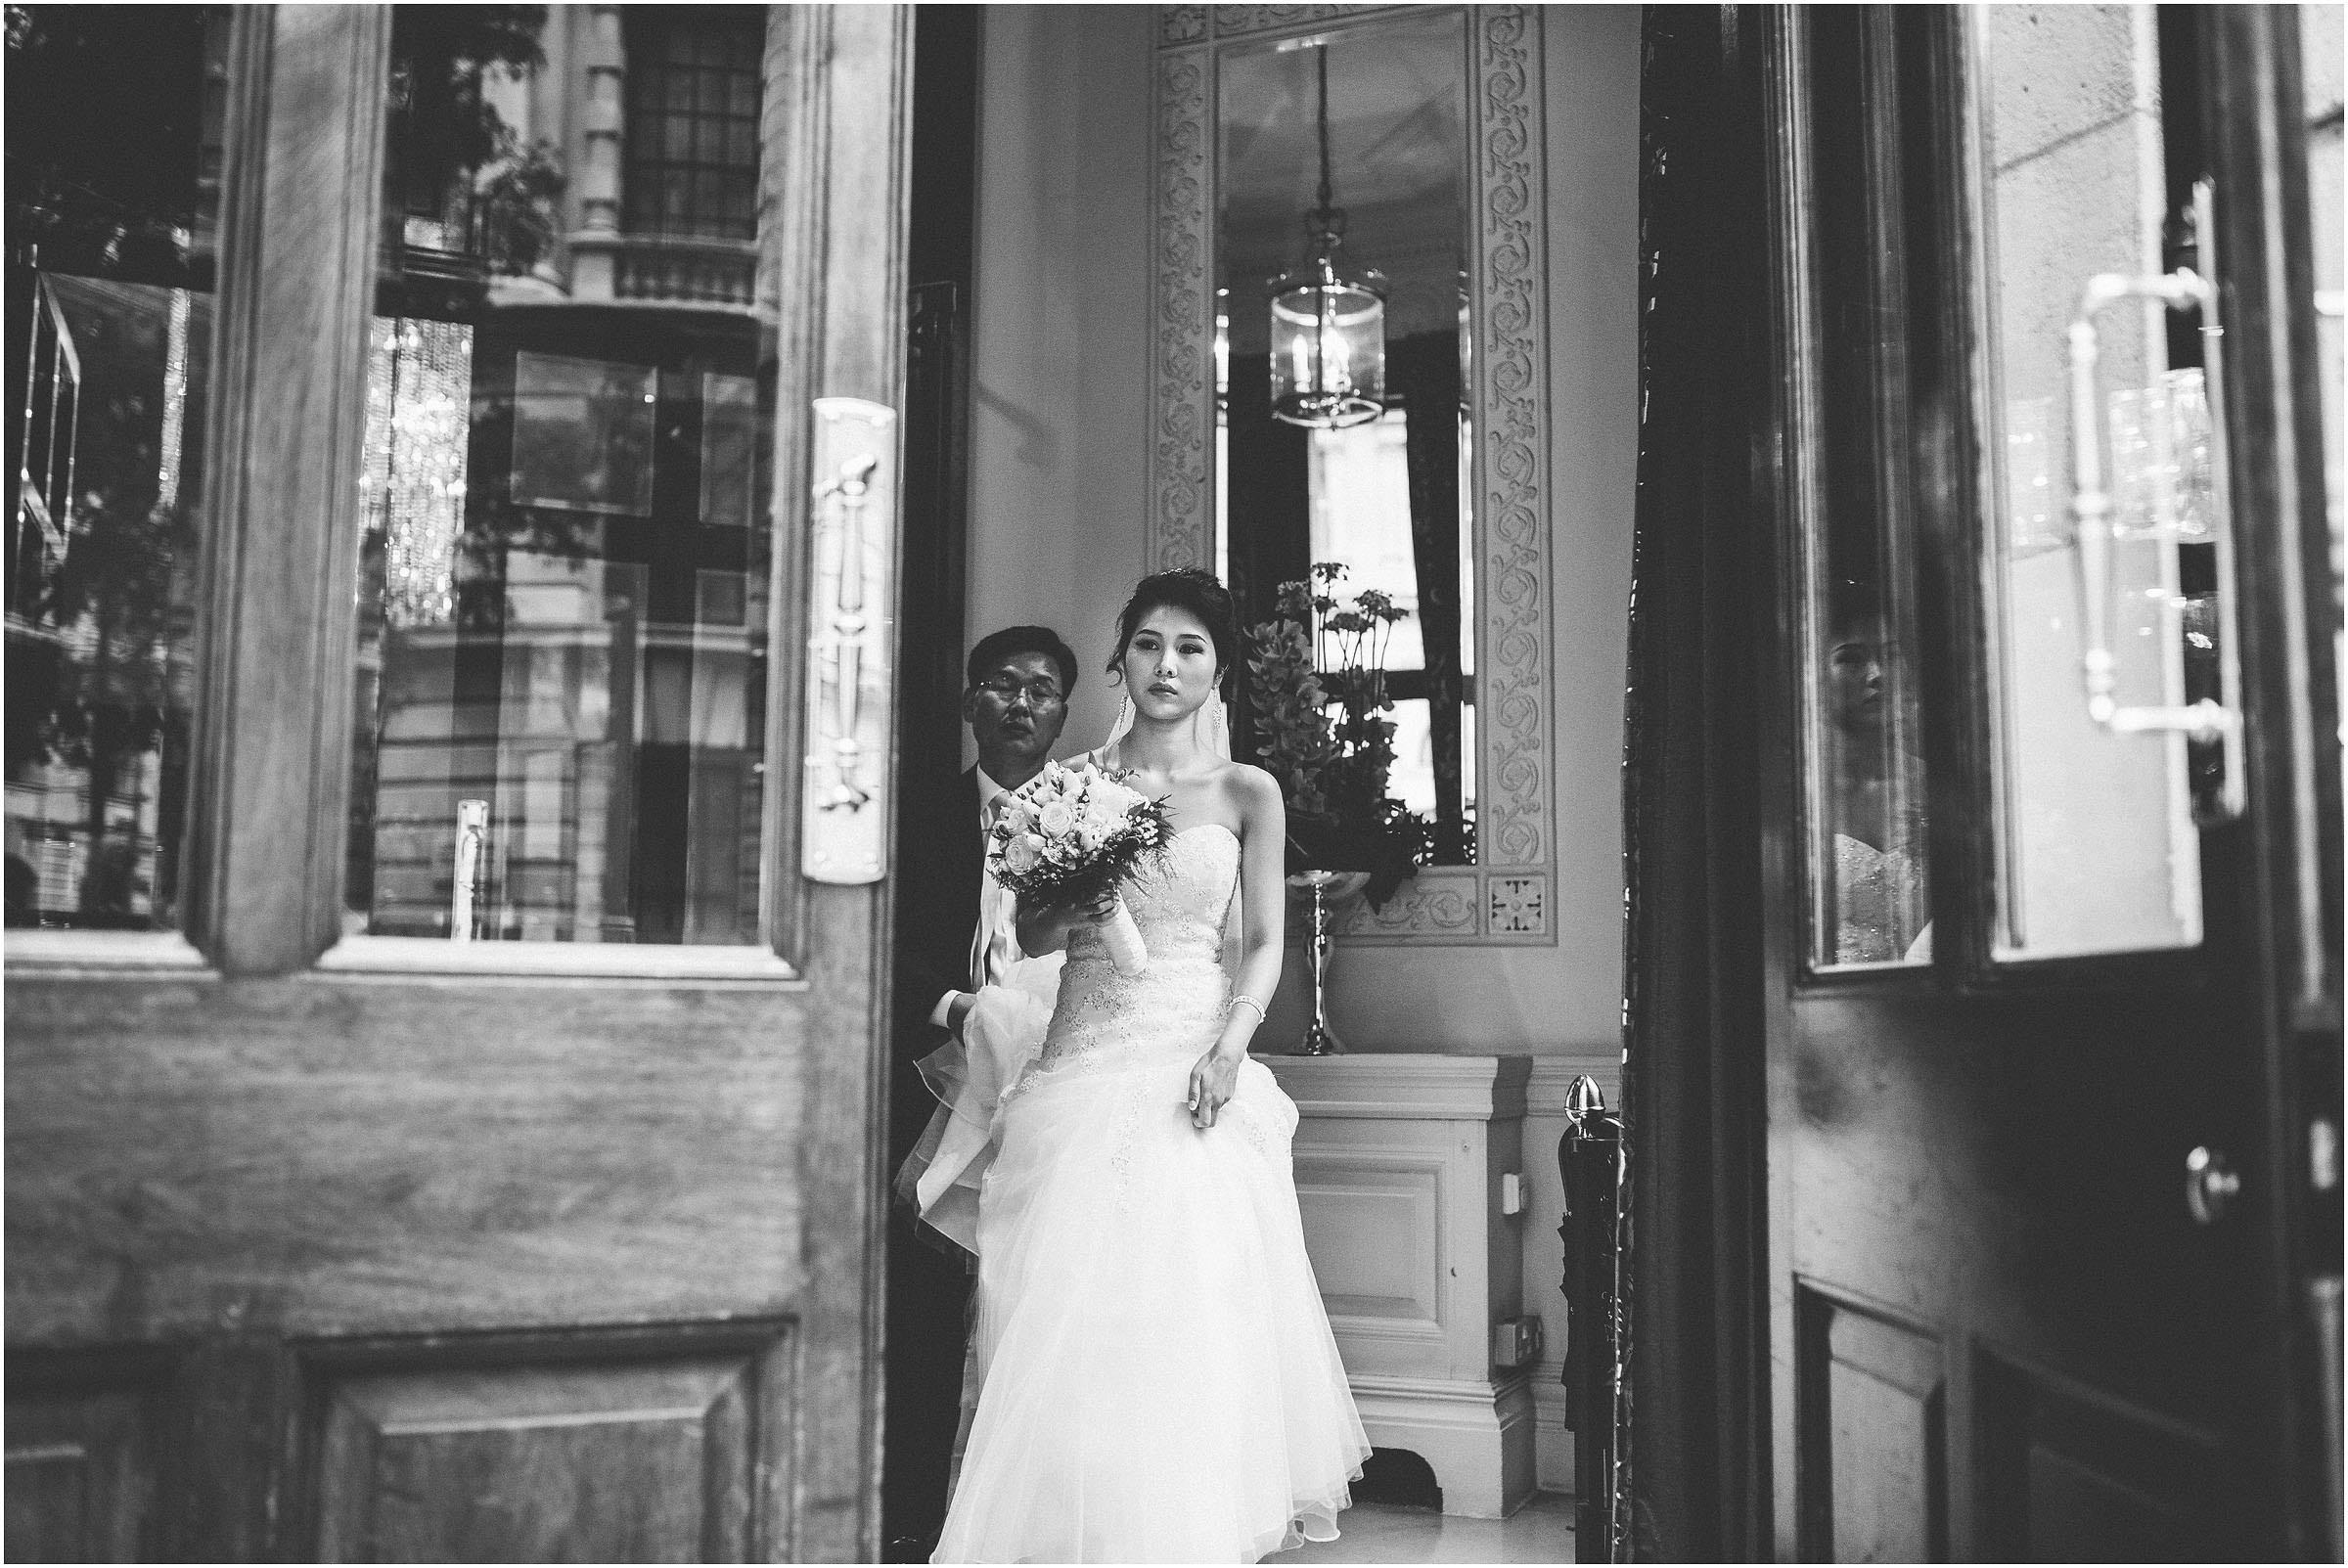 Royal_Horseguards_Wedding_Photography_0024